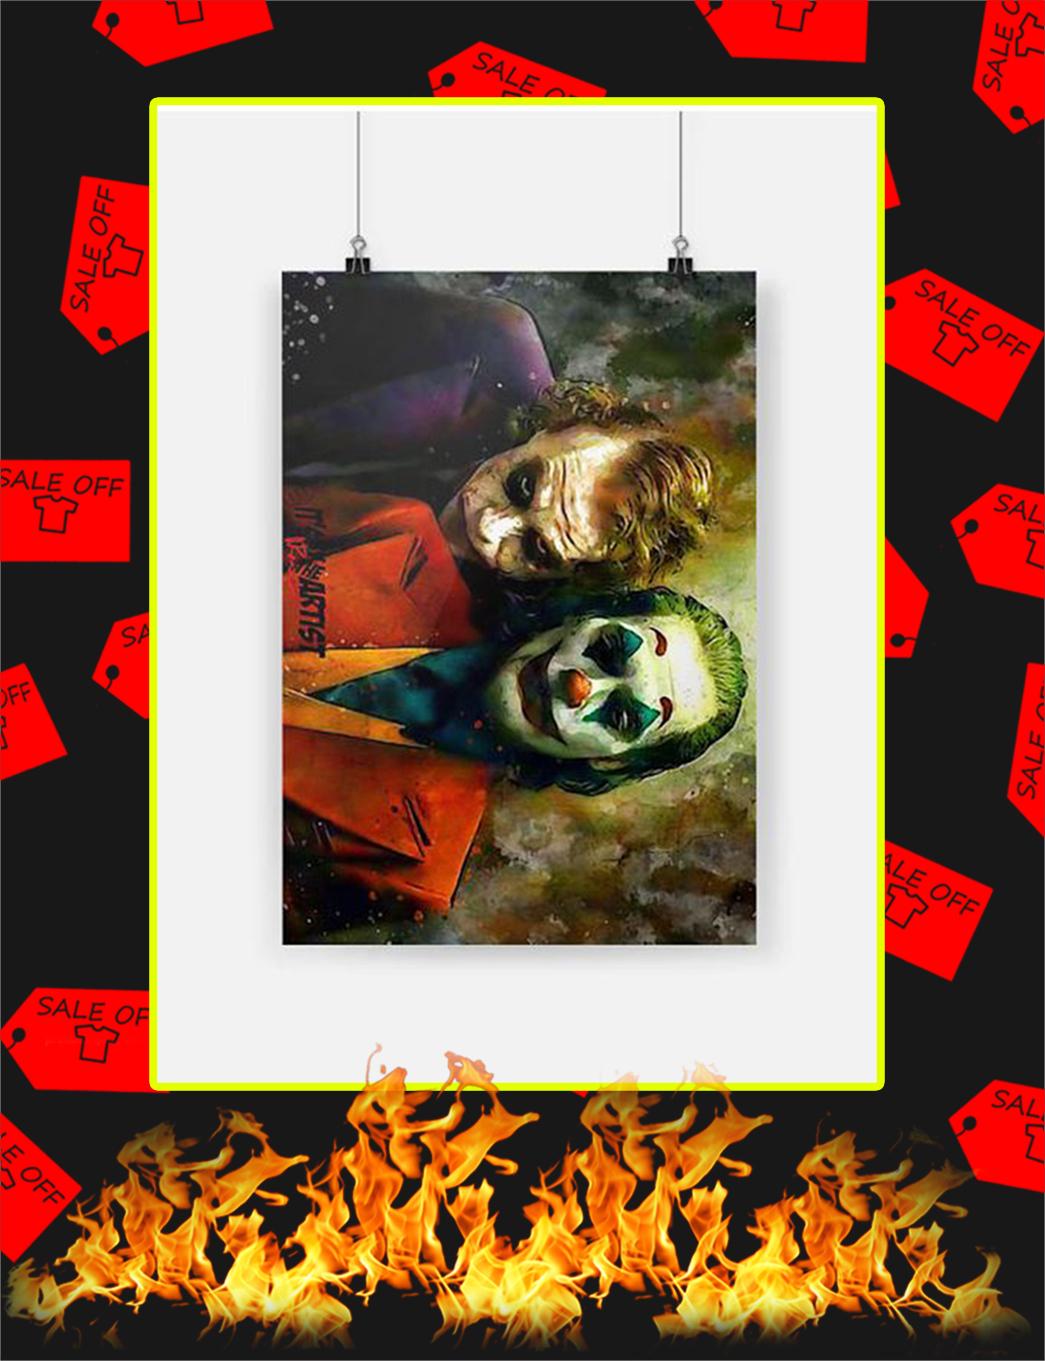 Joker Joaquin Phoenix and Heath Ledger Poster - A1